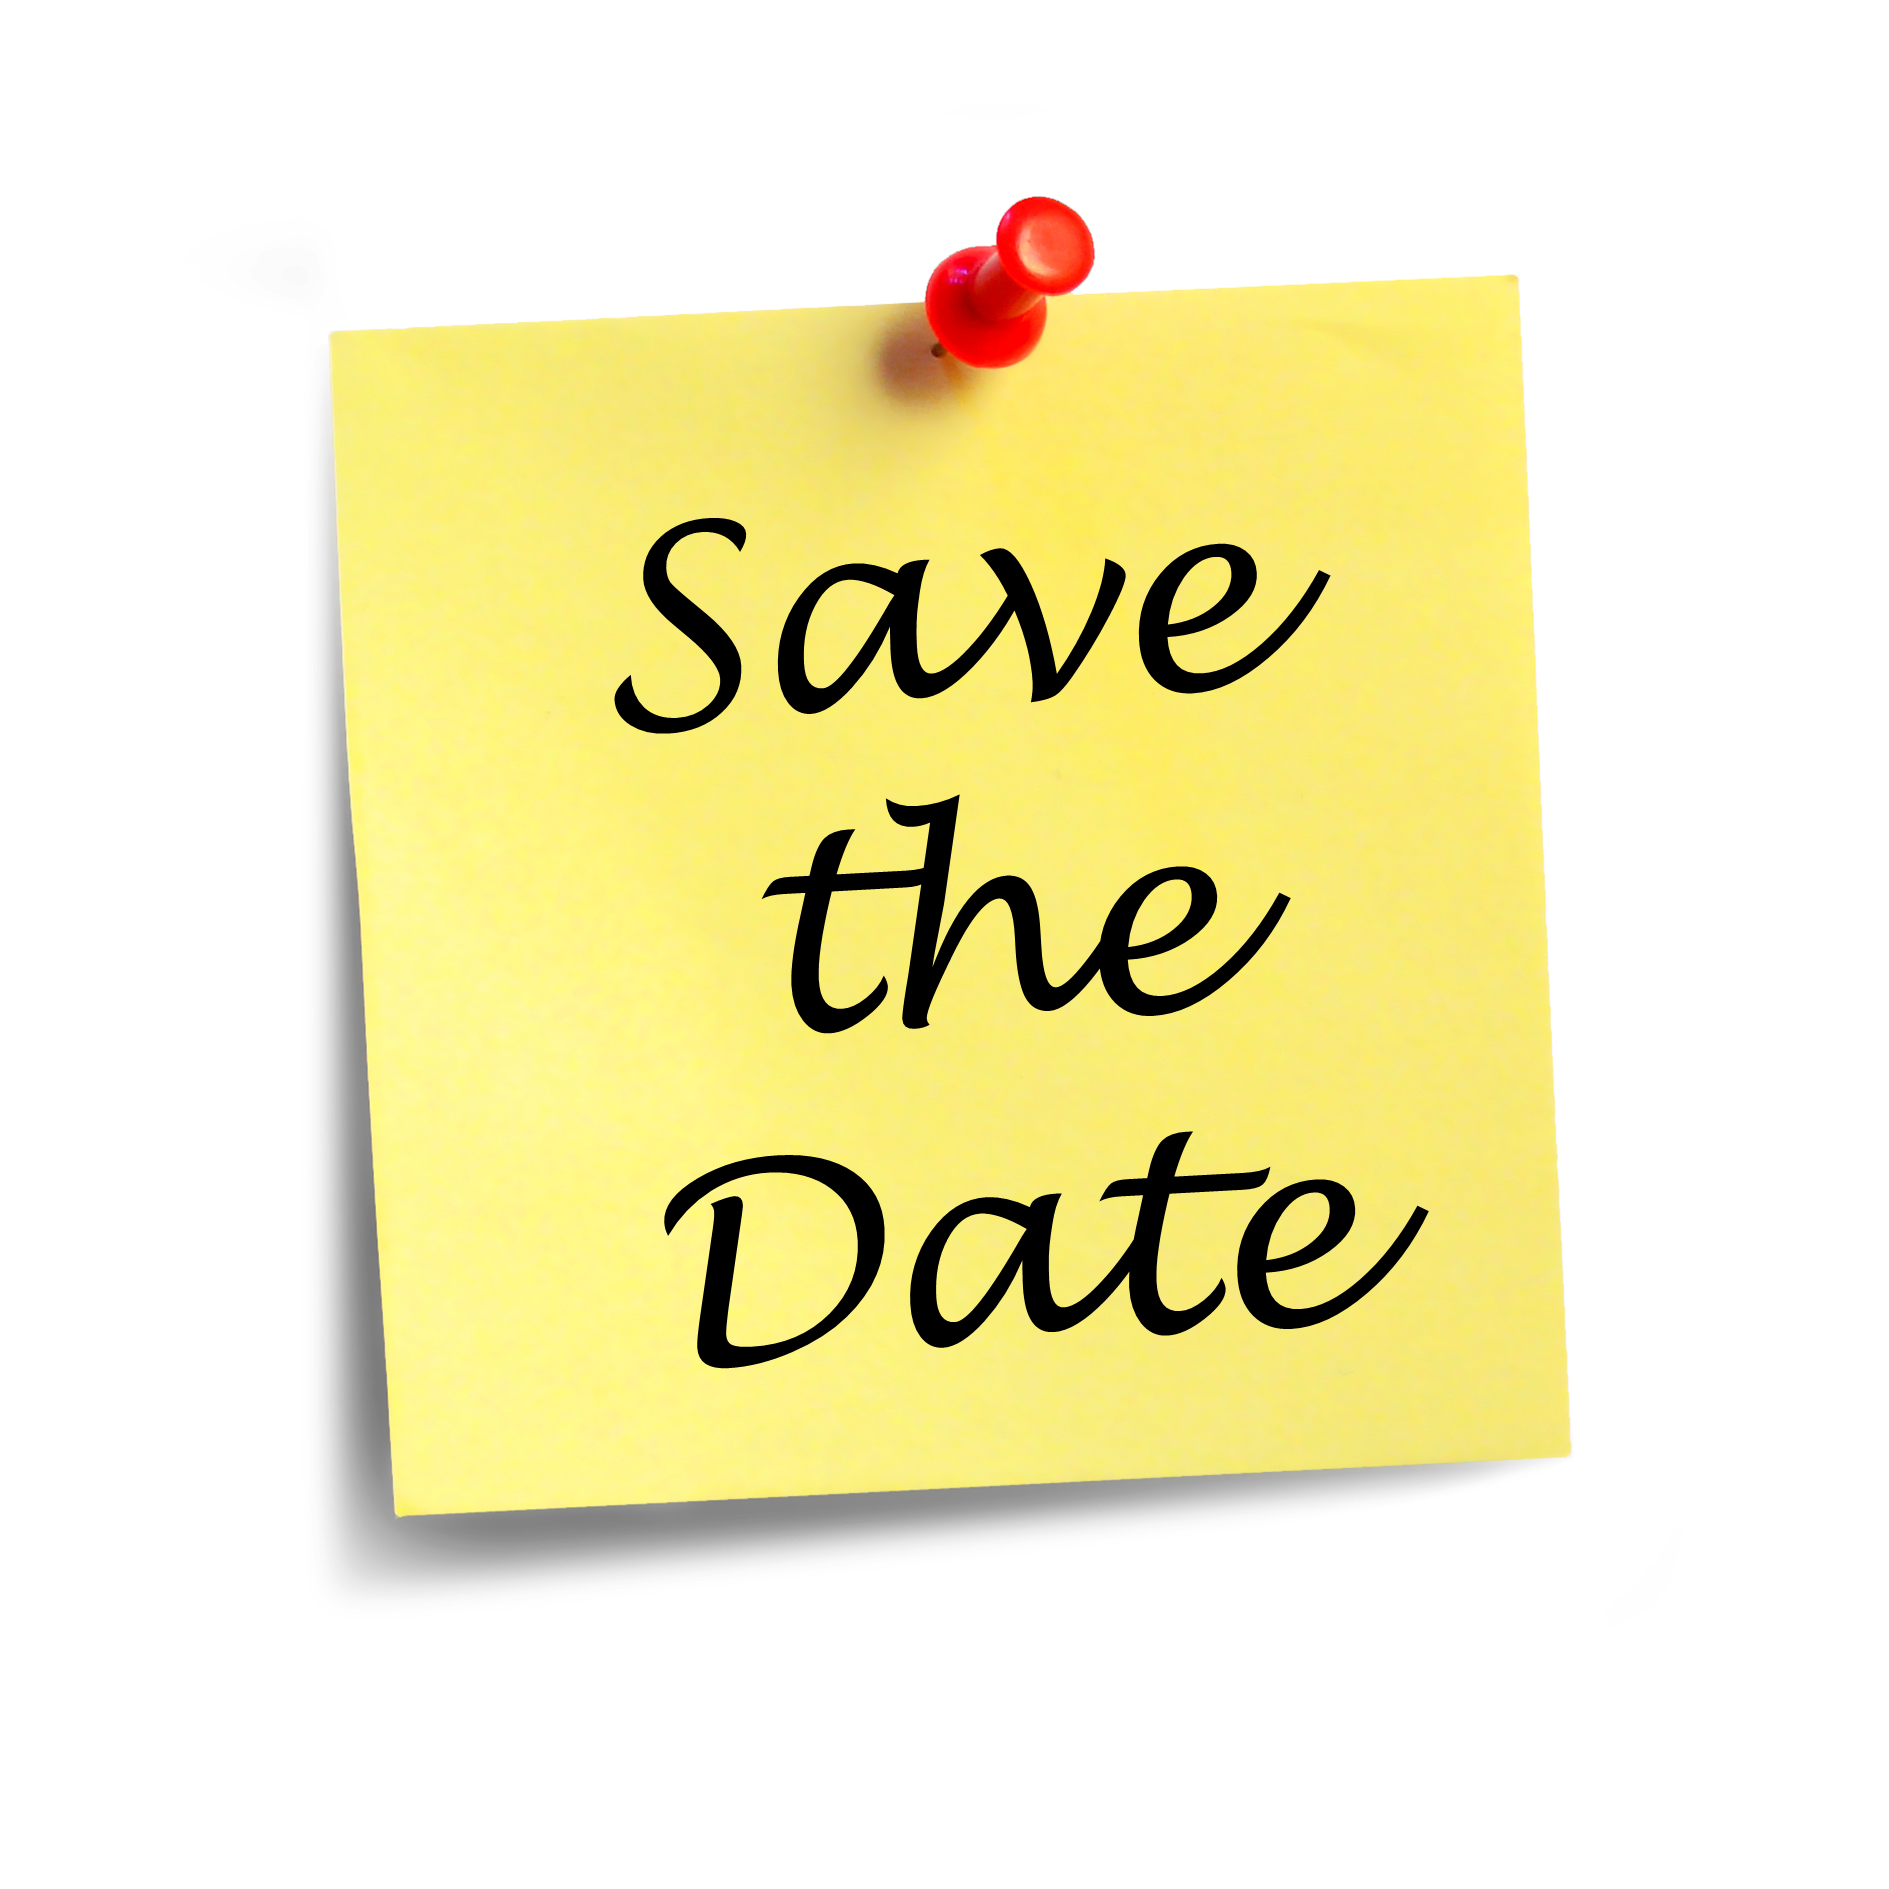 Save the Date - Westside Regional Center